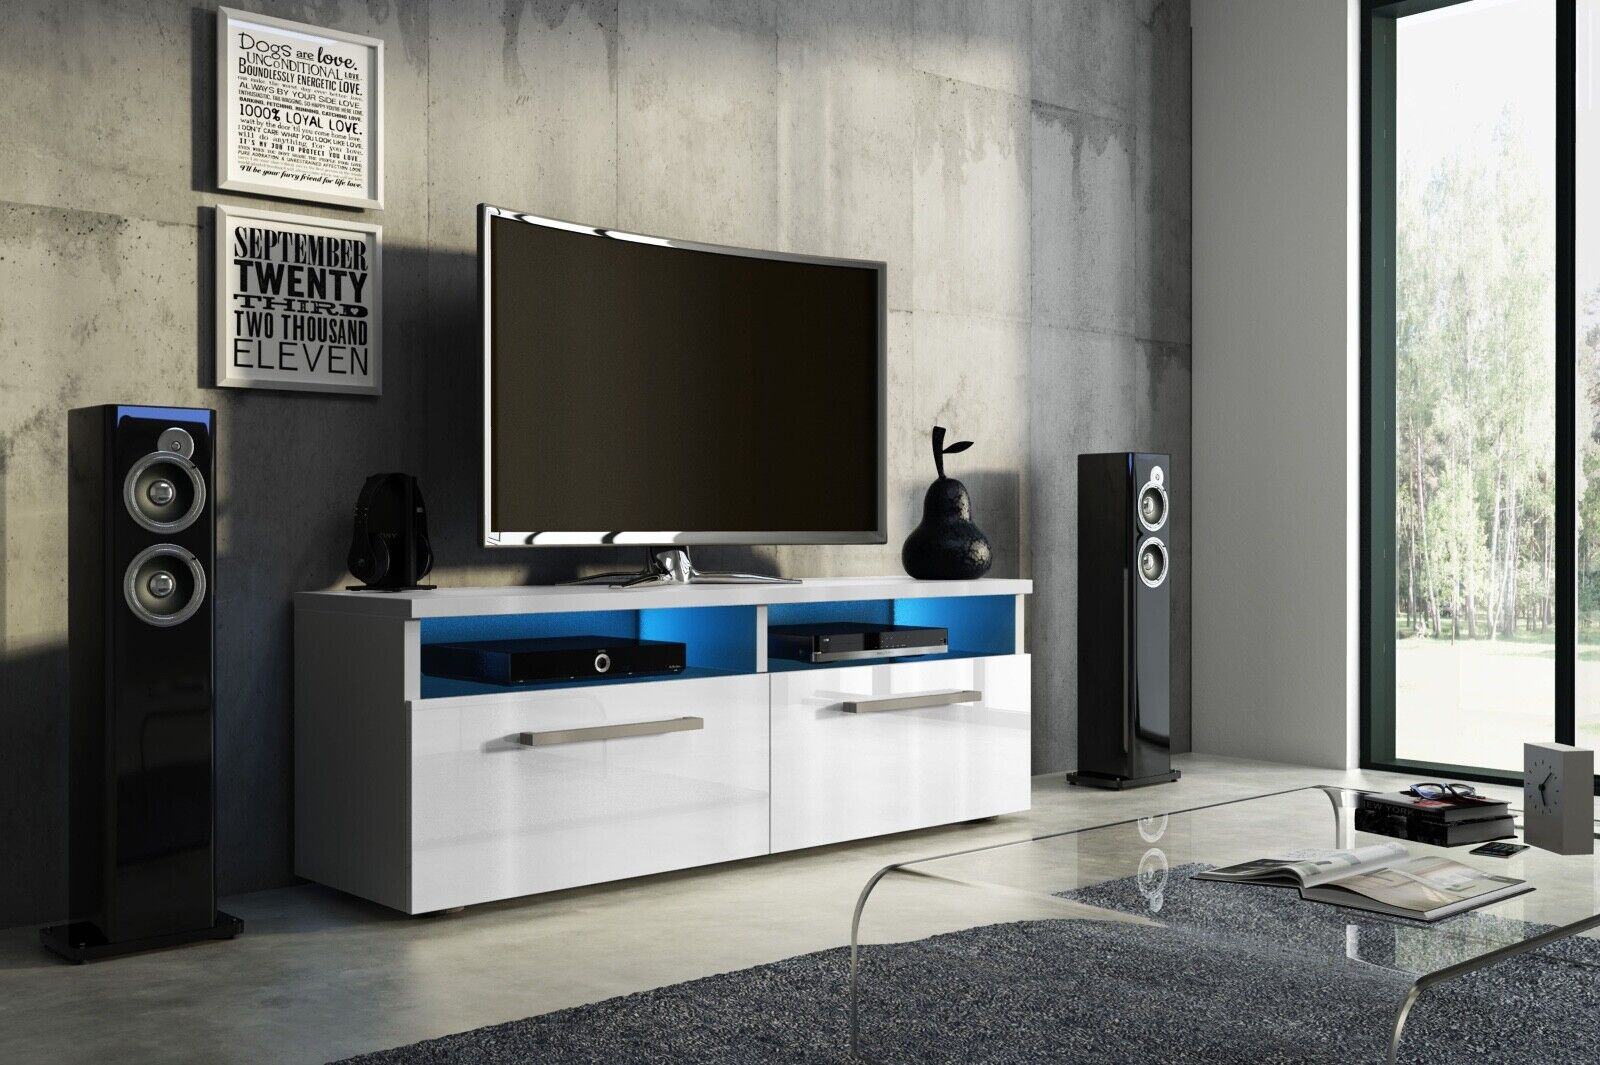 Sideboard Lowboard TV Fernsehschrank BONN 100 cm Kommode inkl LED Highboard NEU